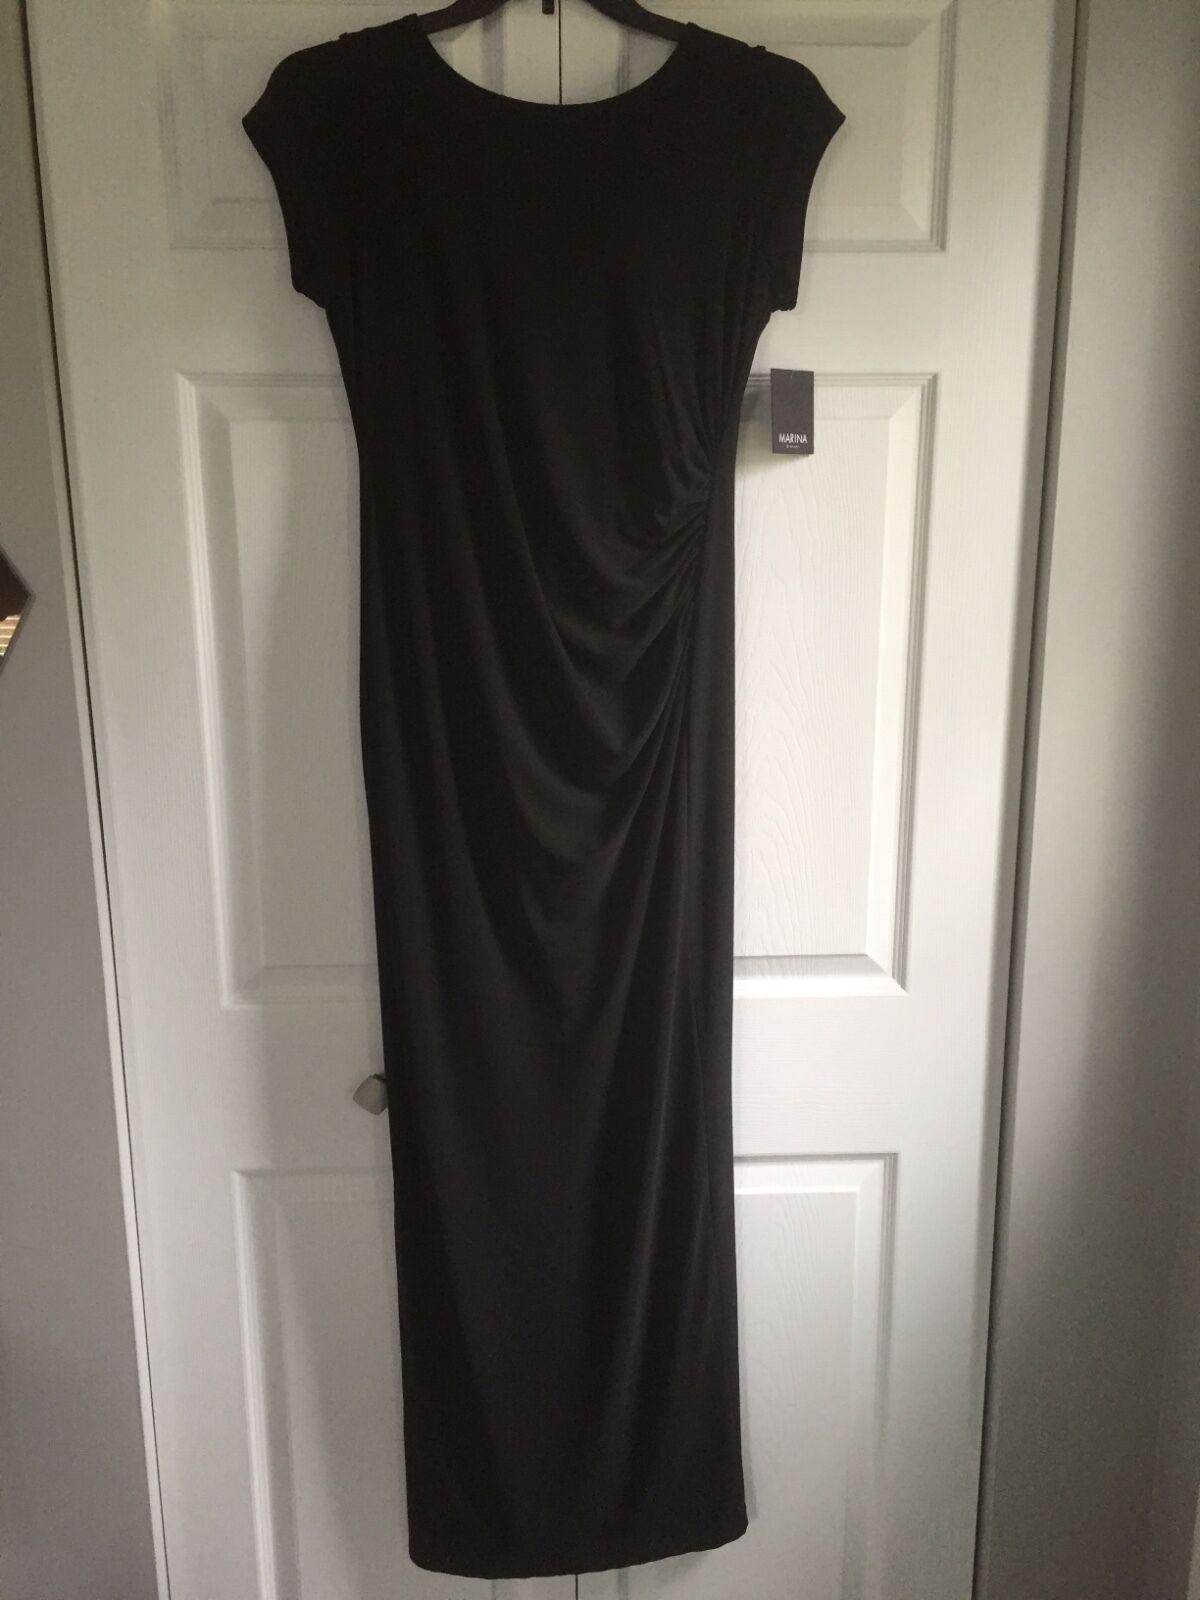 damen Marina dresses floor length schwarz short sleeve stretch dress Größe 10